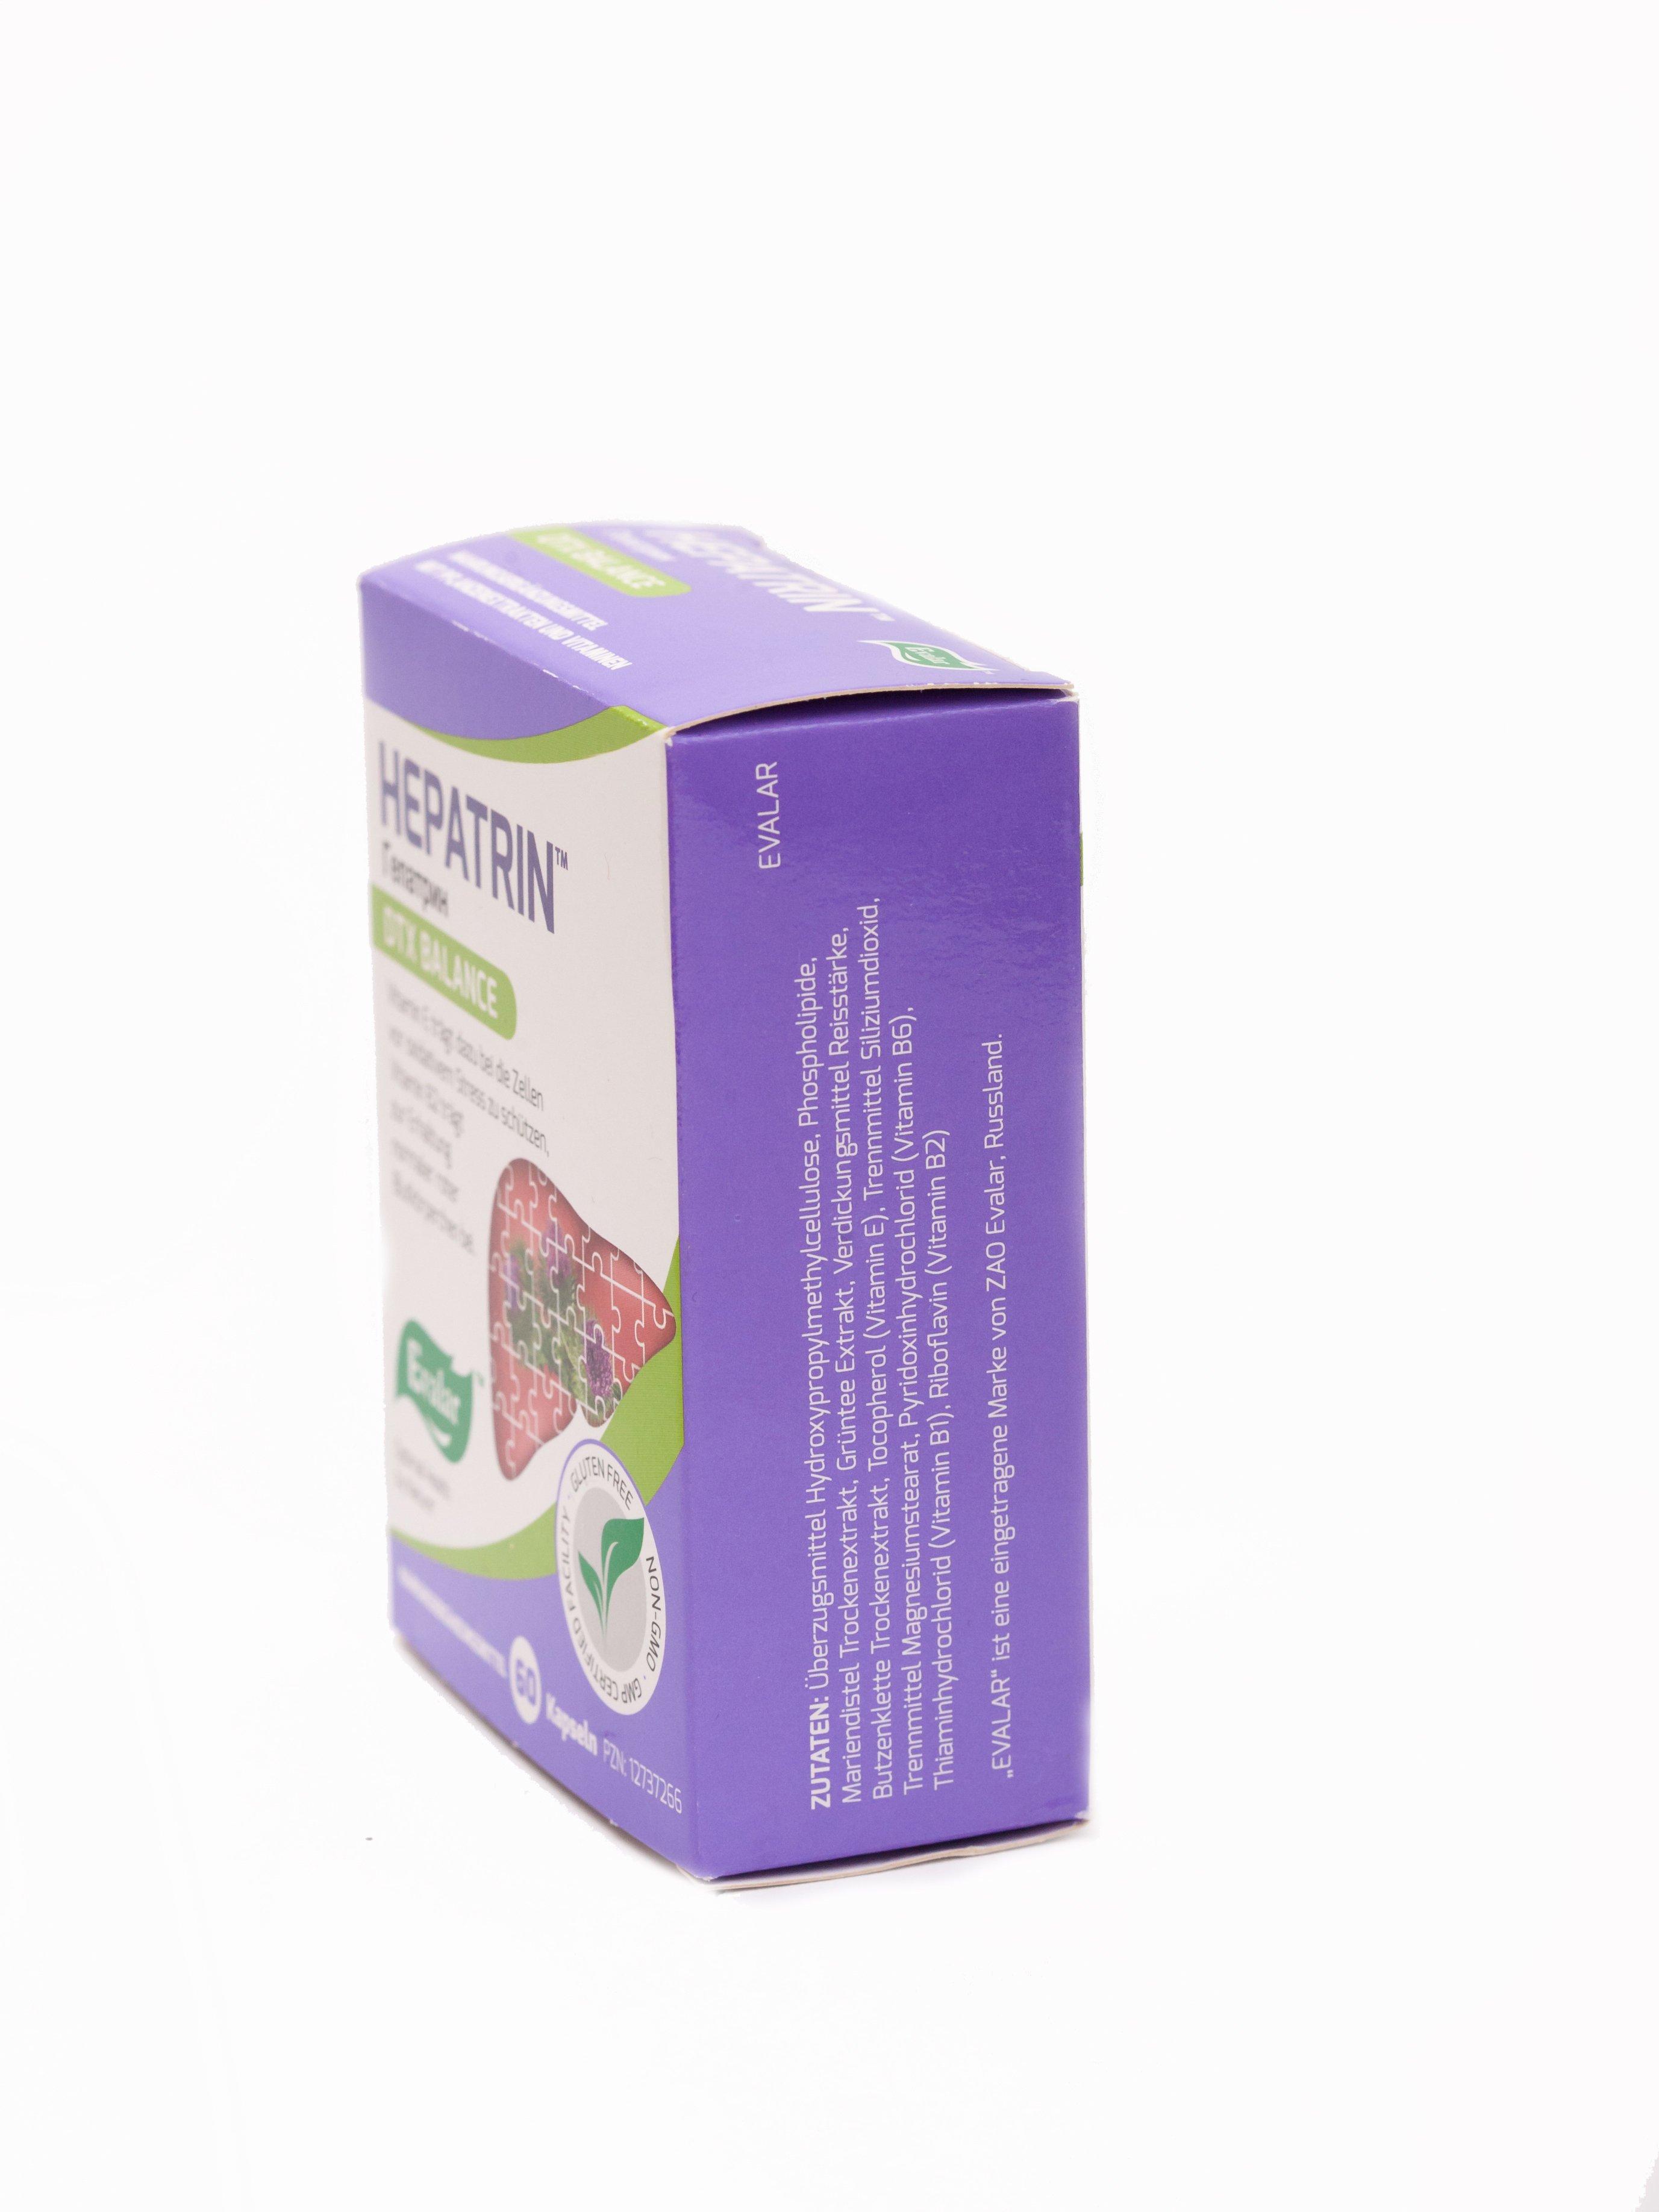 HEPATRIN von Evalar - 60 Kapseln